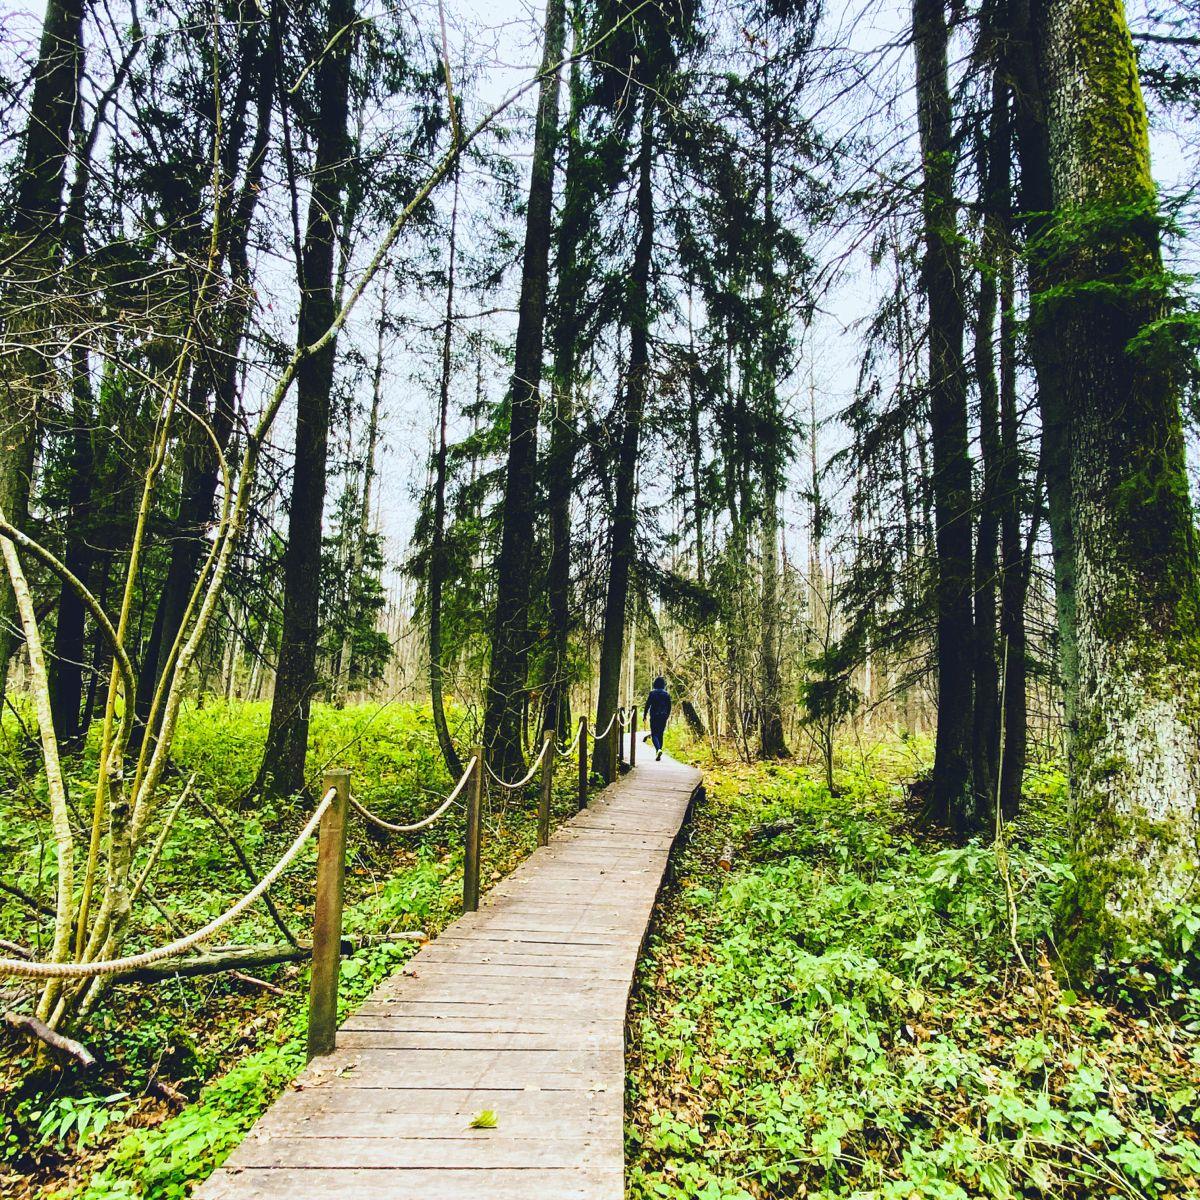 #podlasie #polandtravel #poland #travelideas #travelinspo #travelblogger #bloggingtips #weekend #polska #podróże